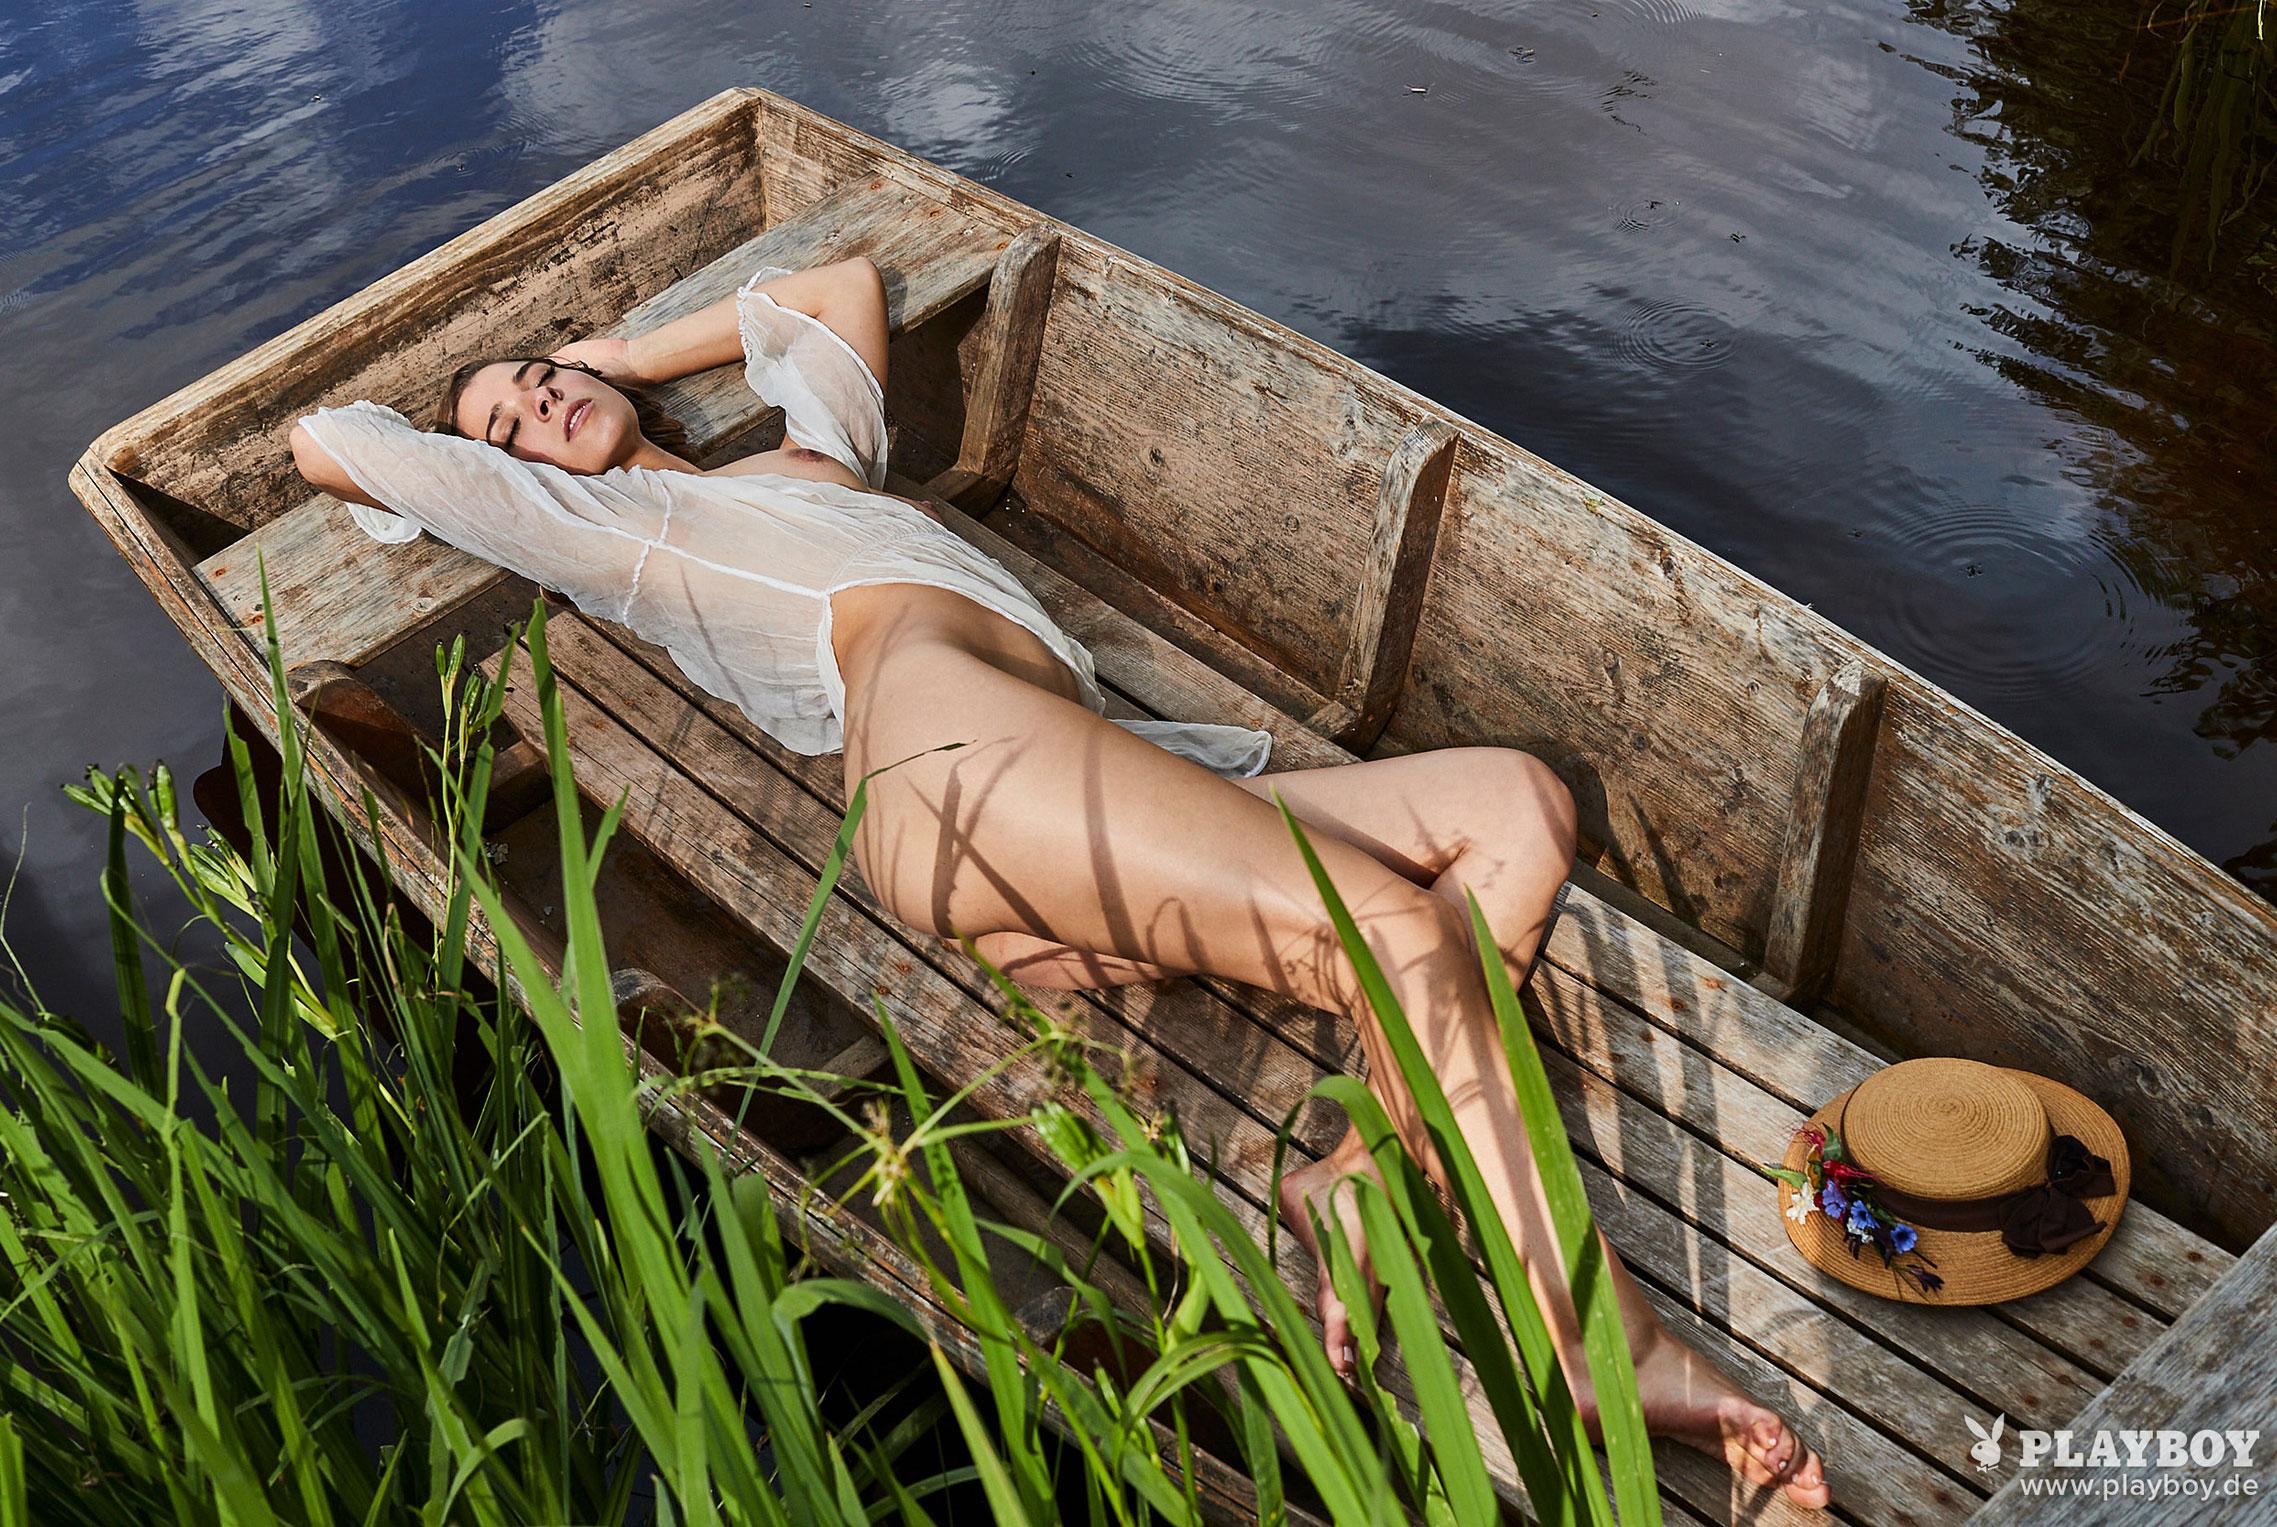 Stella Tiana Stegmann - Miss Oktoberfest 2019 Playboy Germany